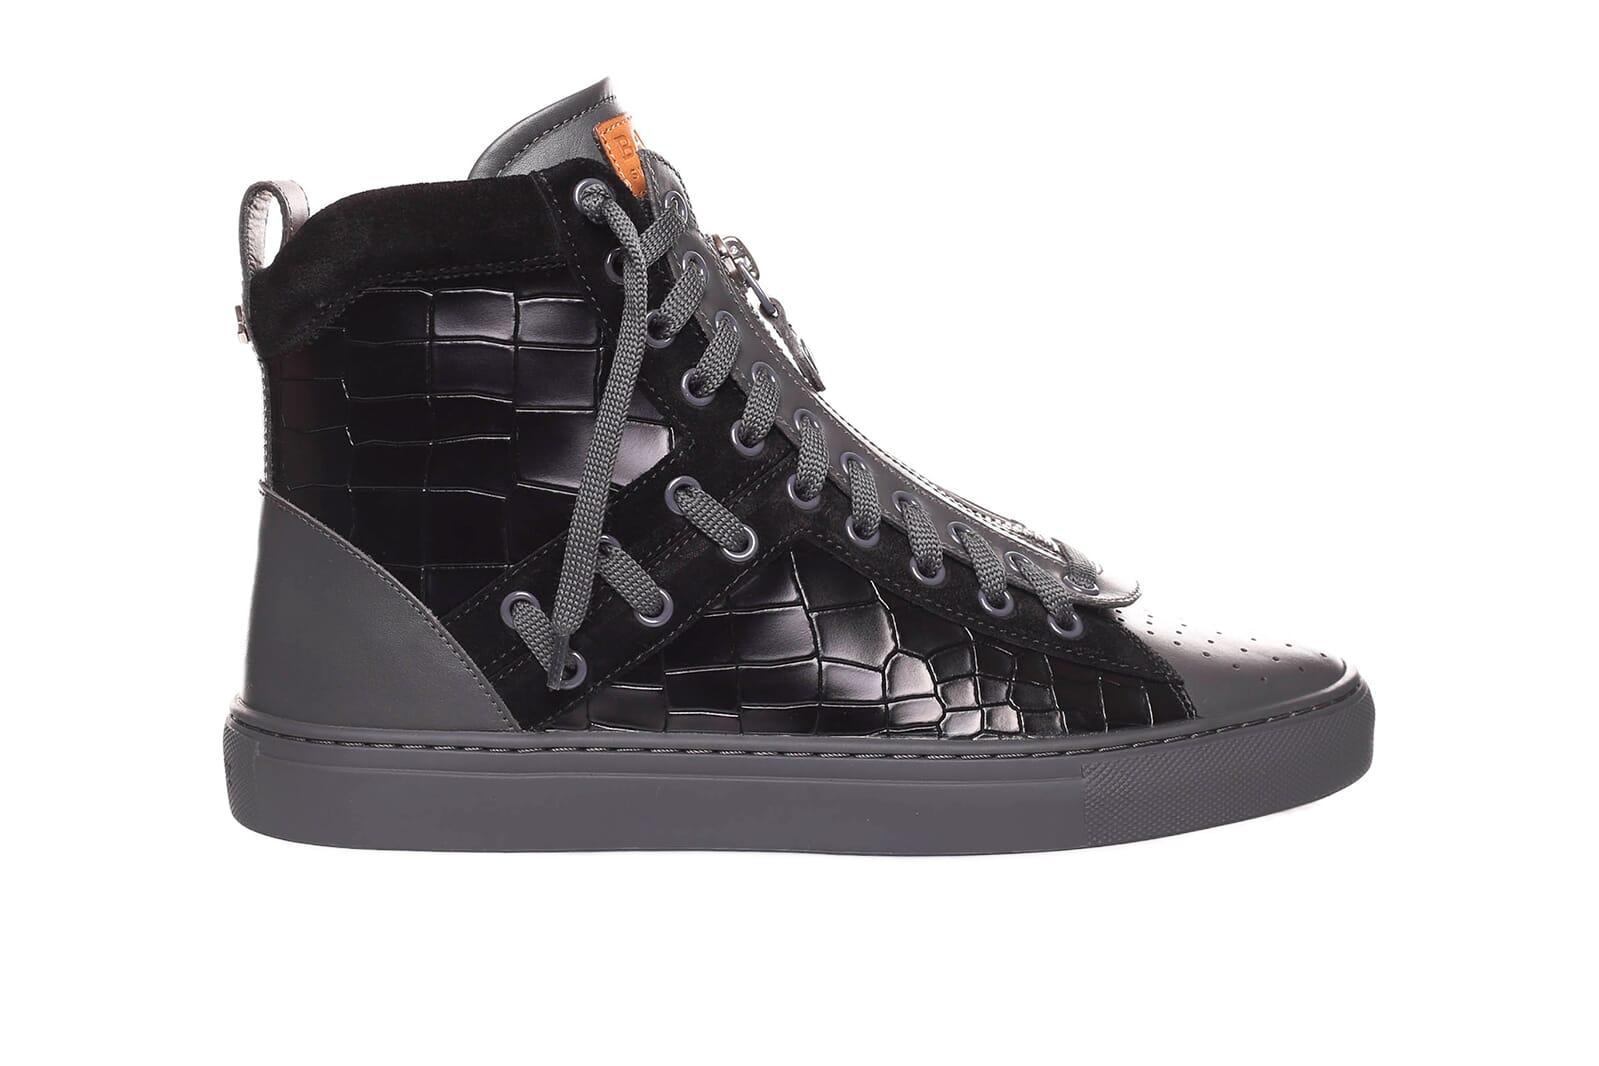 Bally Hekem Men's High Top Sneaker in